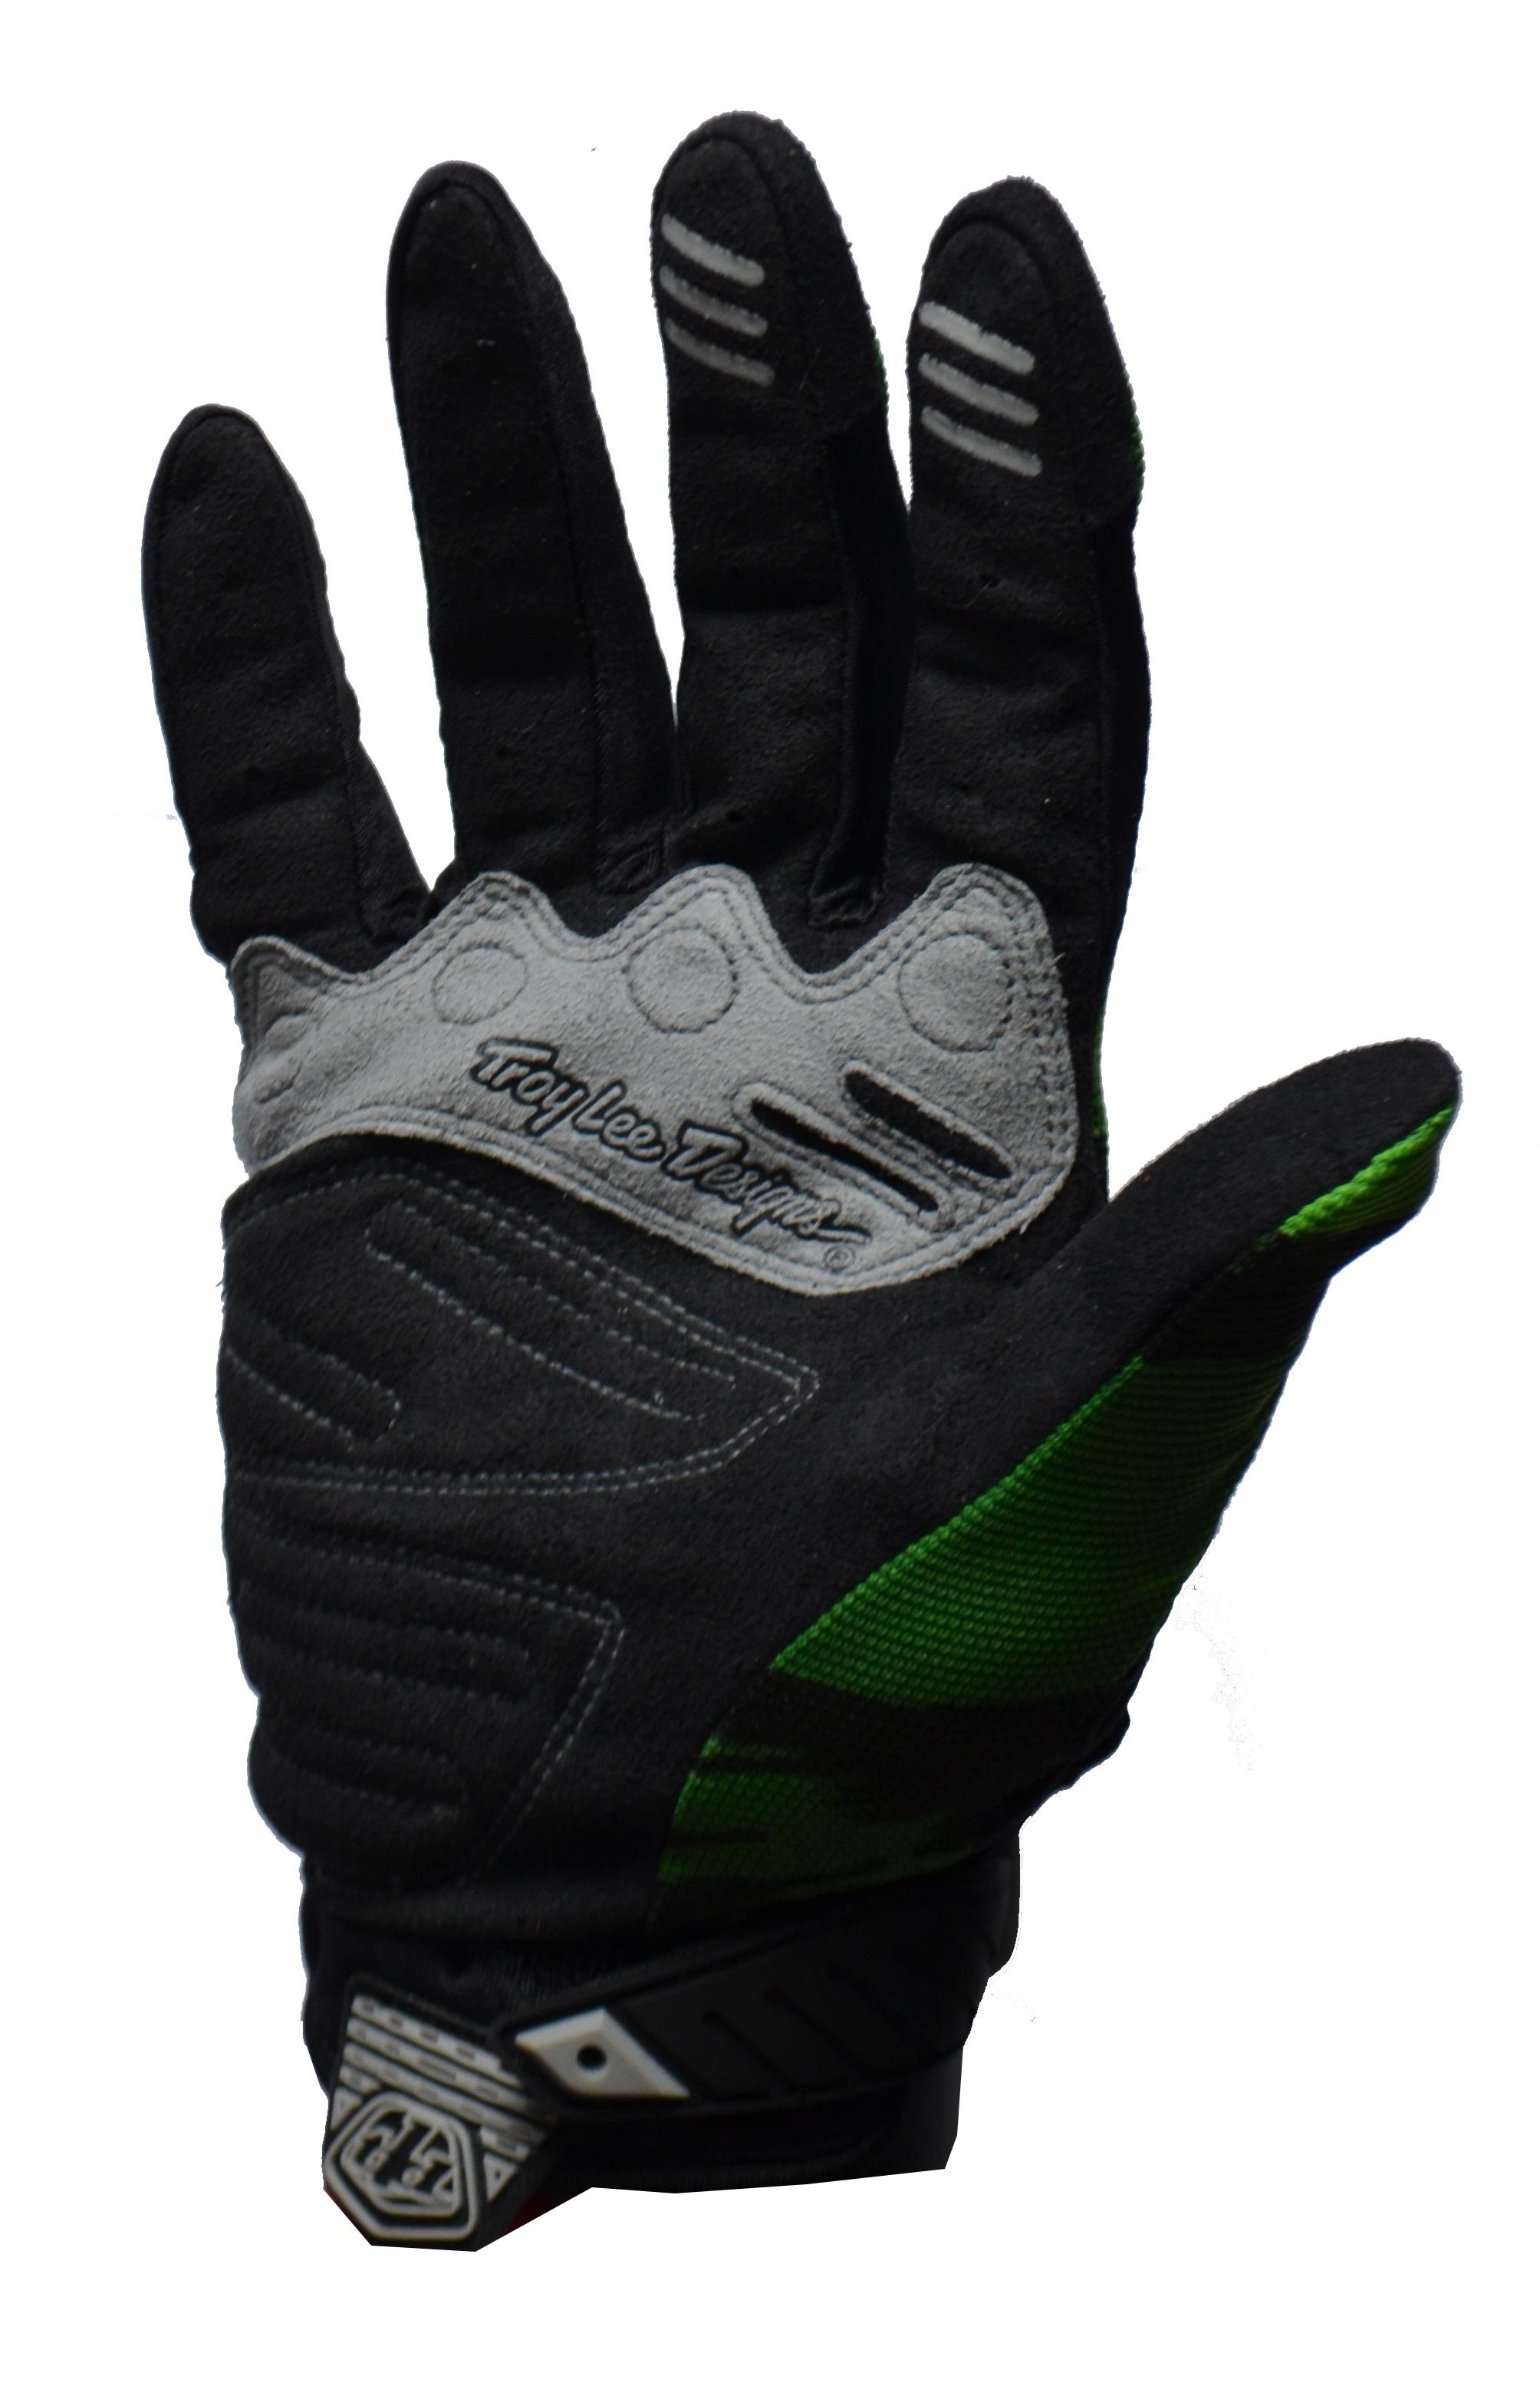 Мотоперчатки Troy Lee  Артмото - купить квадроцикл в украине и харькове, мотоцикл, снегоход, скутер, мопед, электромобиль